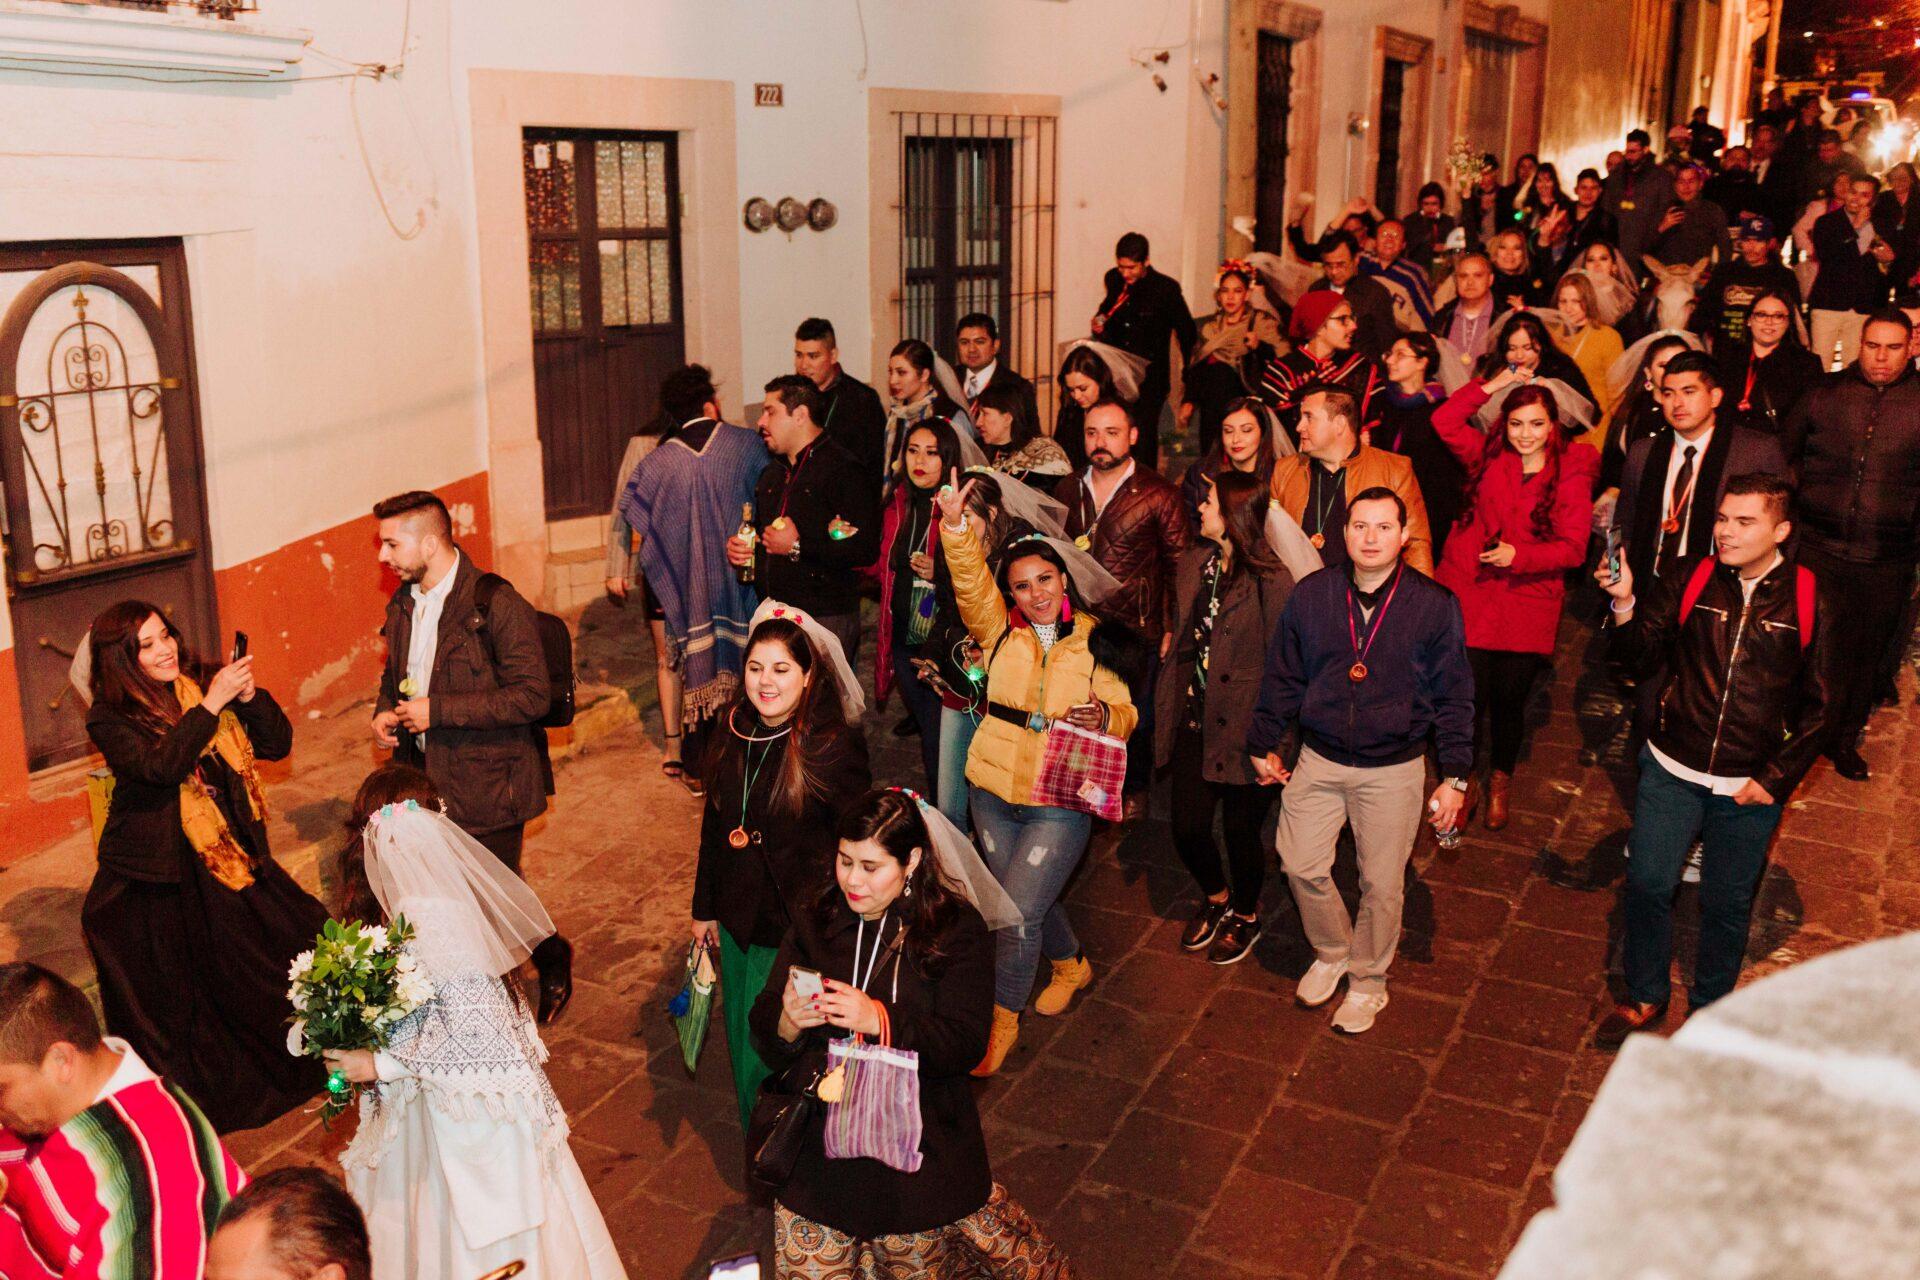 javier_noriega_fotografo_bodas_la_mina_club_zacatecas_wedding_photographer44